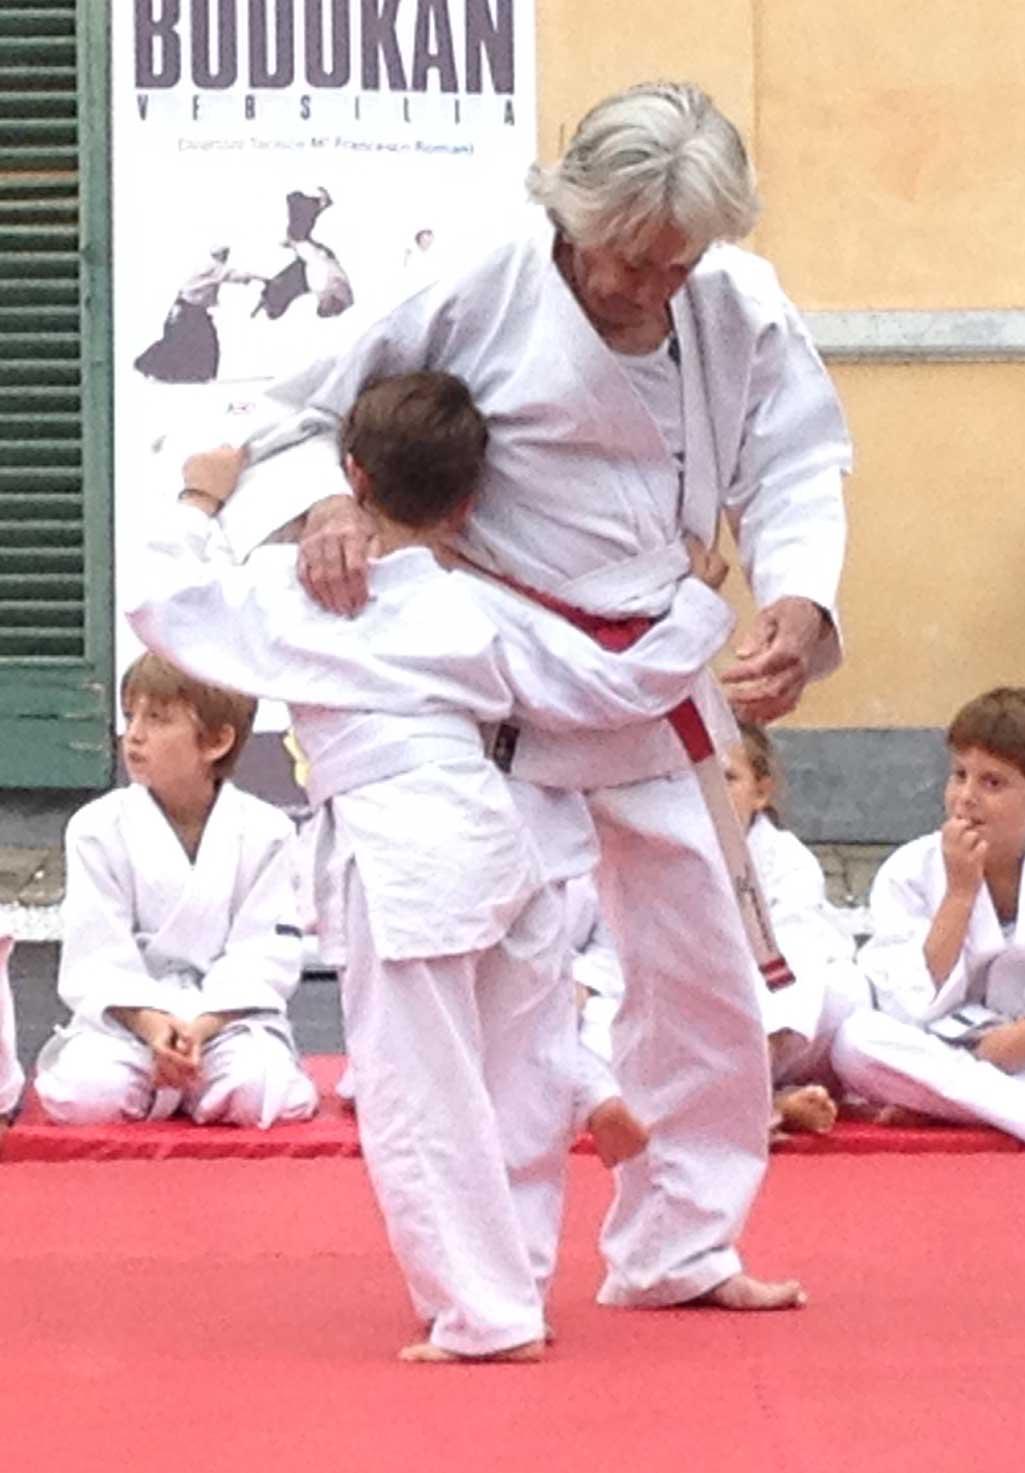 Judo@Budokan